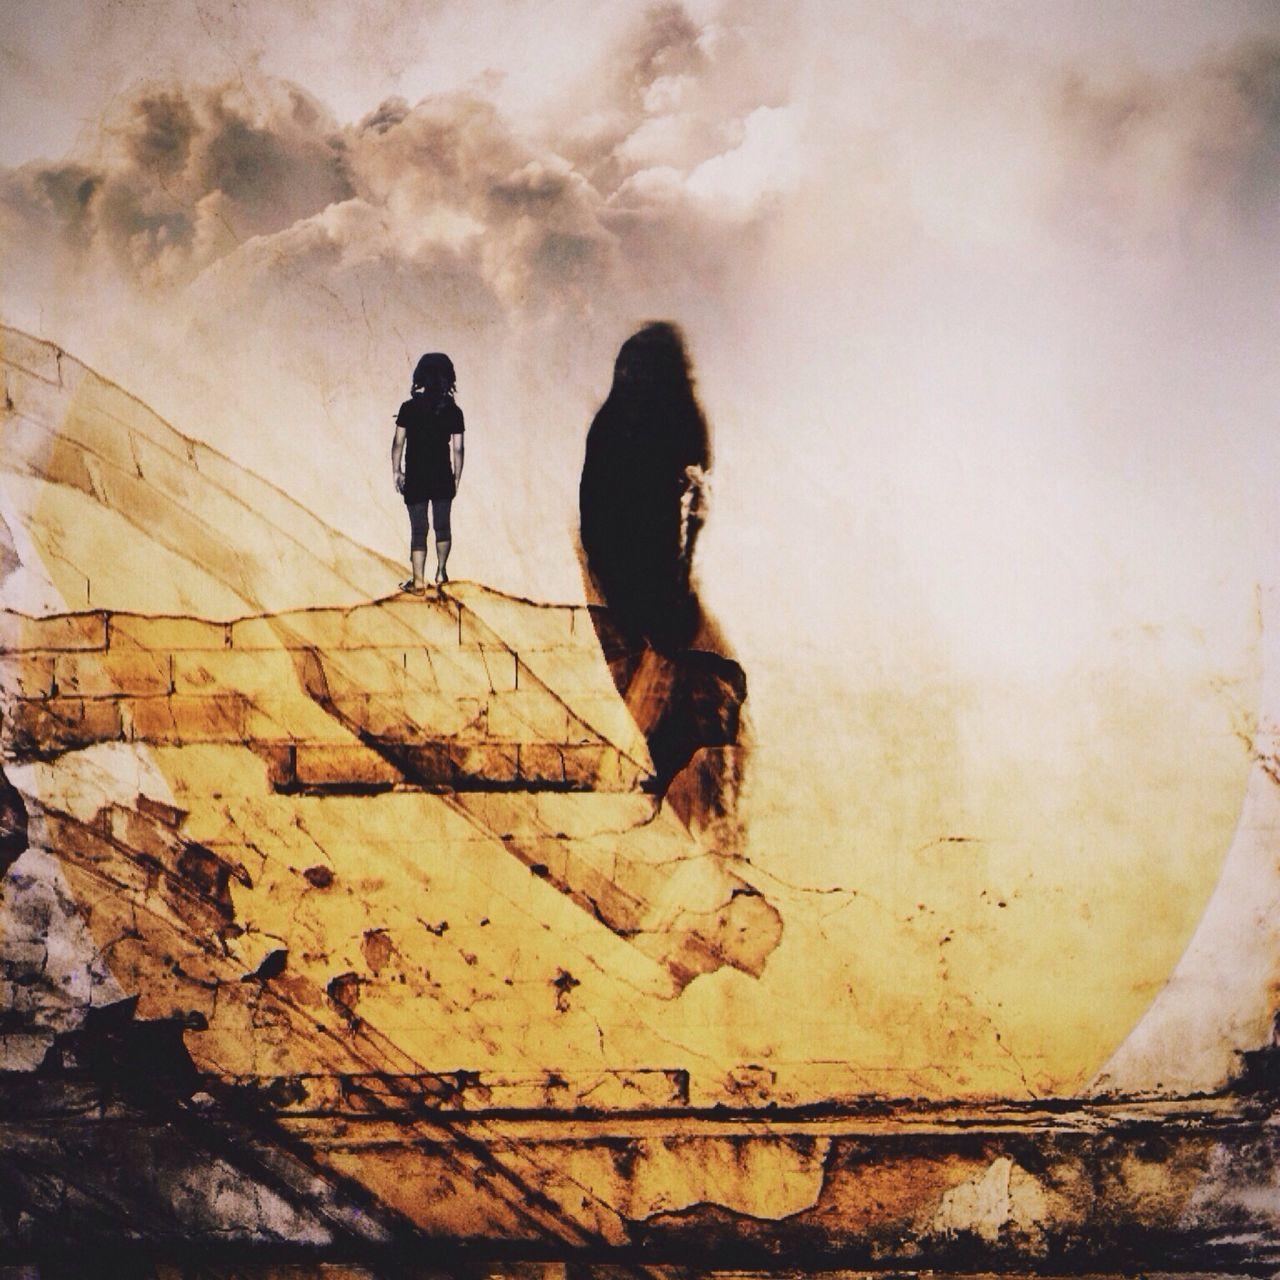 Your life is ahead of you NEM GoodKarma Surrealism WeAreJuxt.com Collage